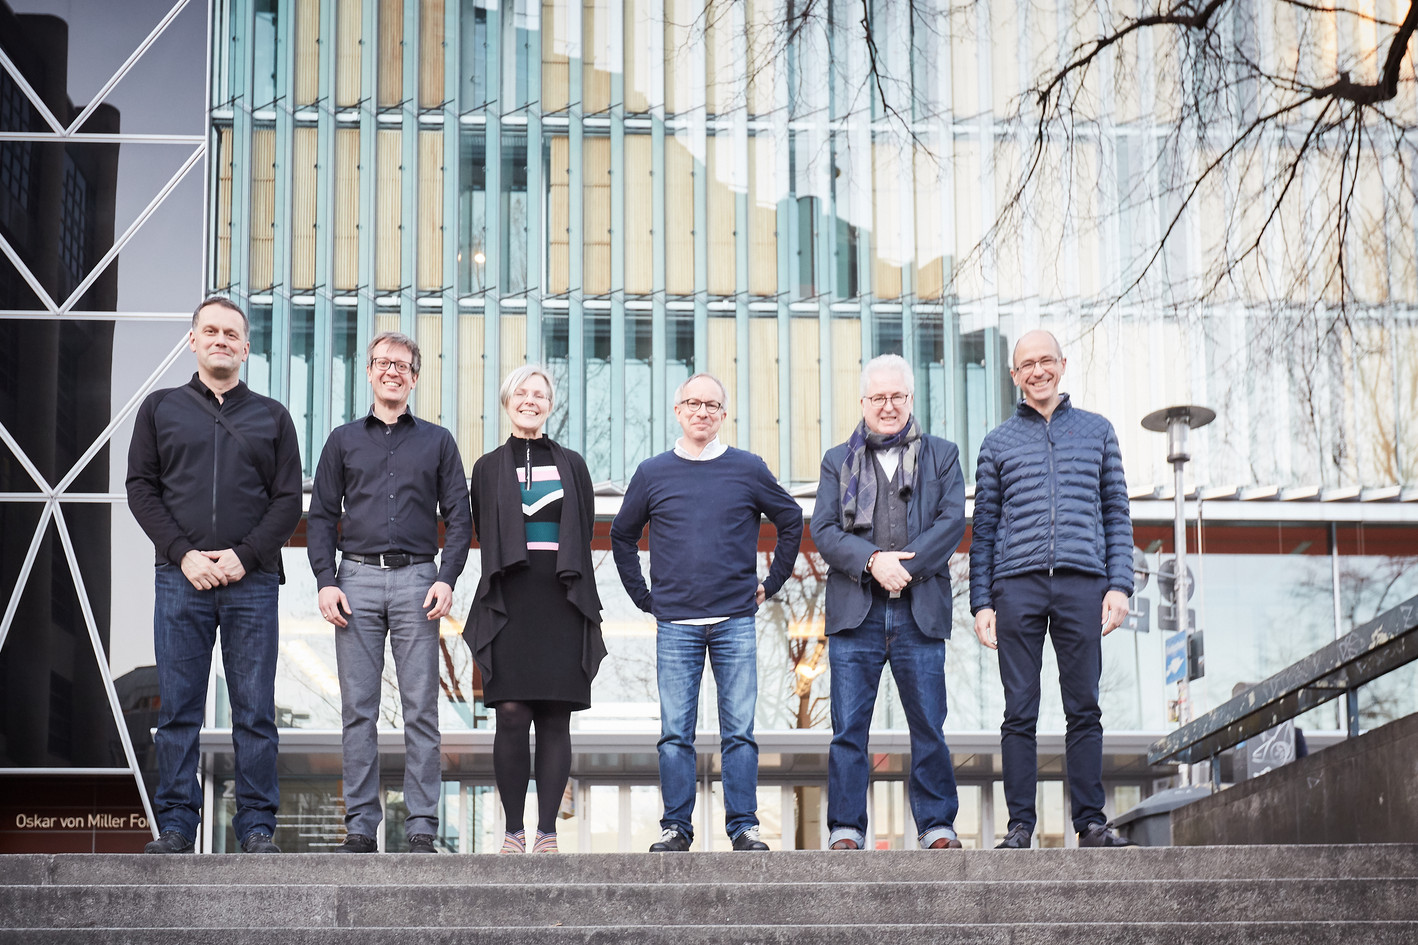 Von links nach rechts: Tim Oelker, Moritz Segers, Veronika Eggers, Martin Fössleitner, Uni. Prof. Wolfgang Sattler, Michael Schlenke